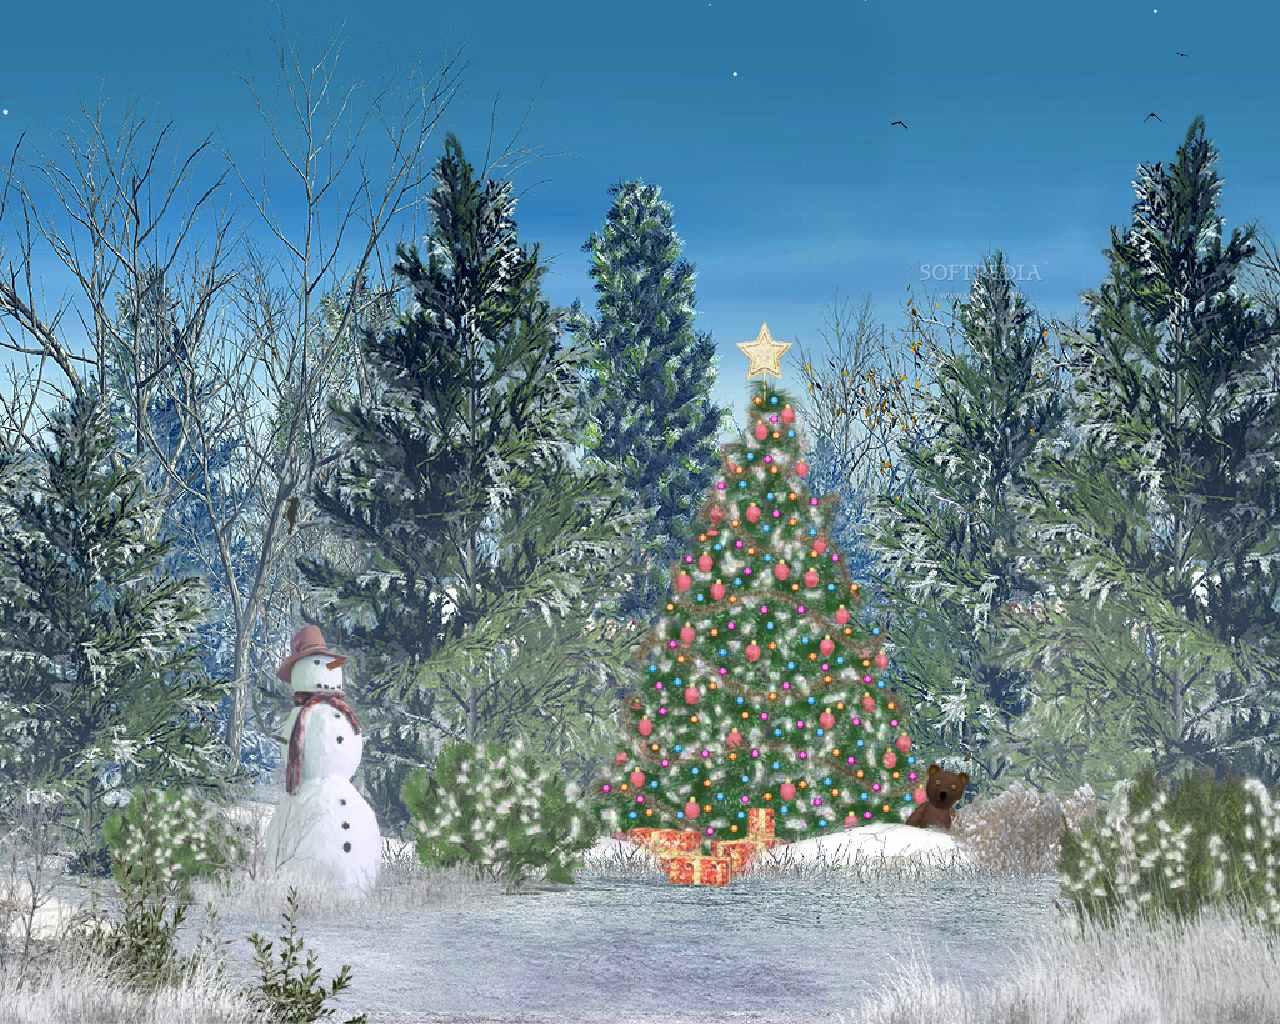 animated christmas desktop background |Desktop Wallpapers